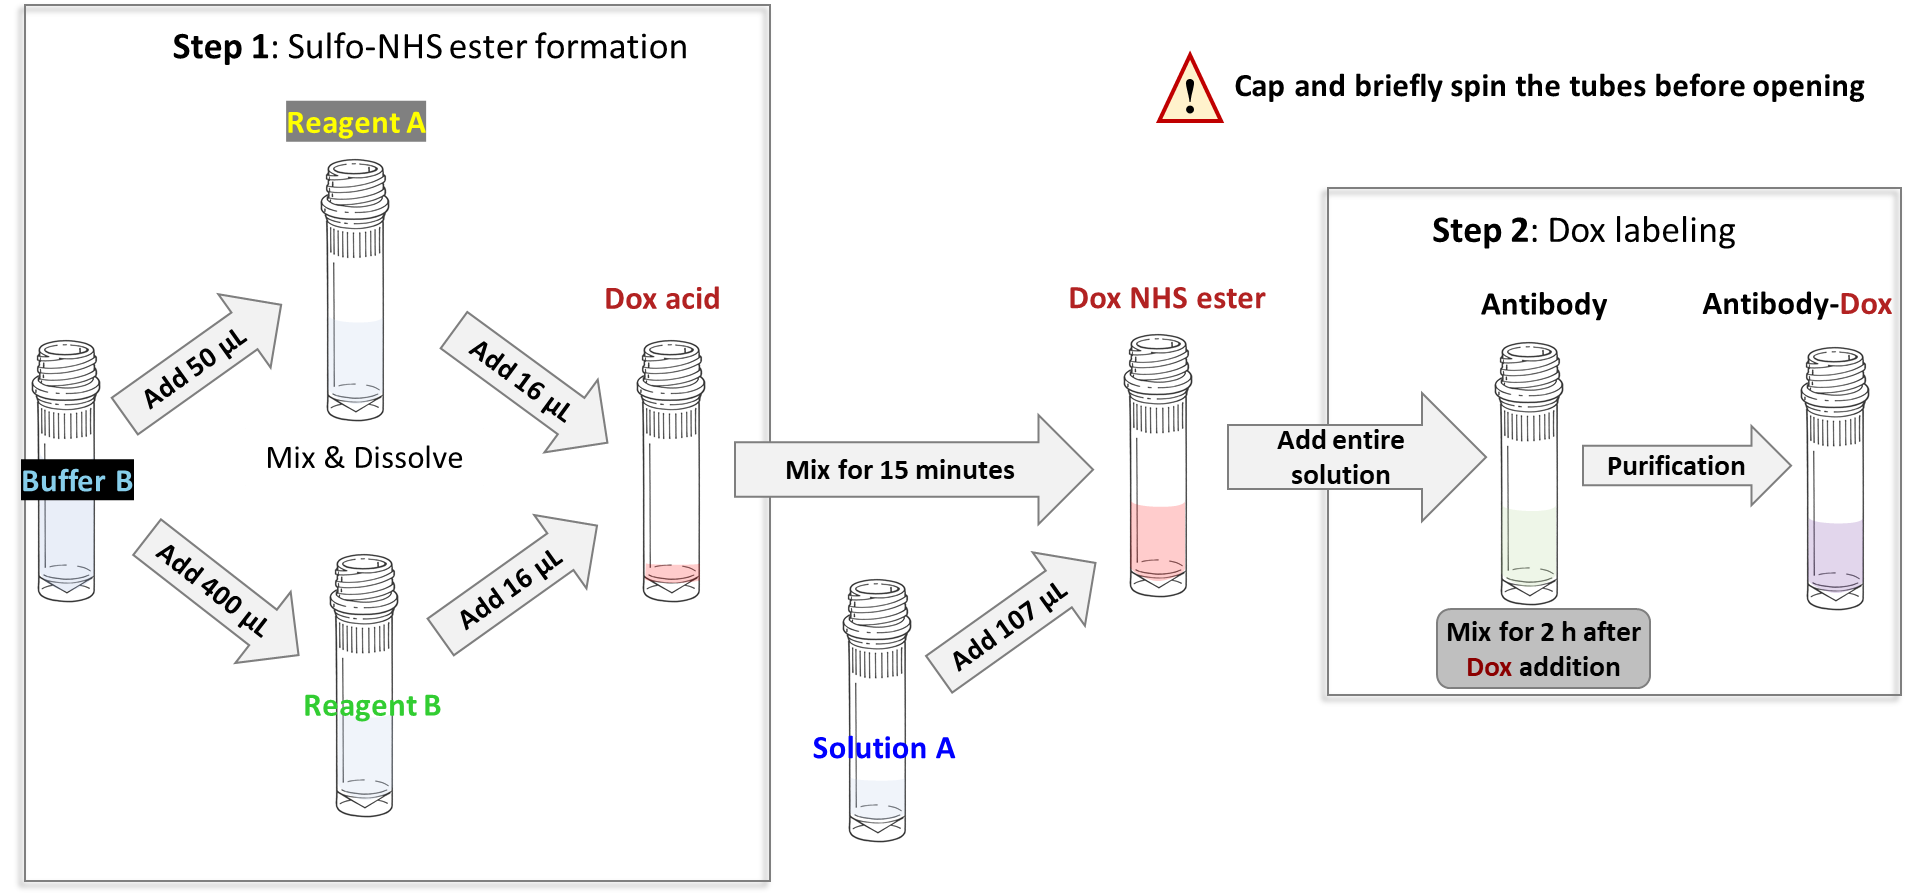 cm11406-antibody-dox-scheme2.png